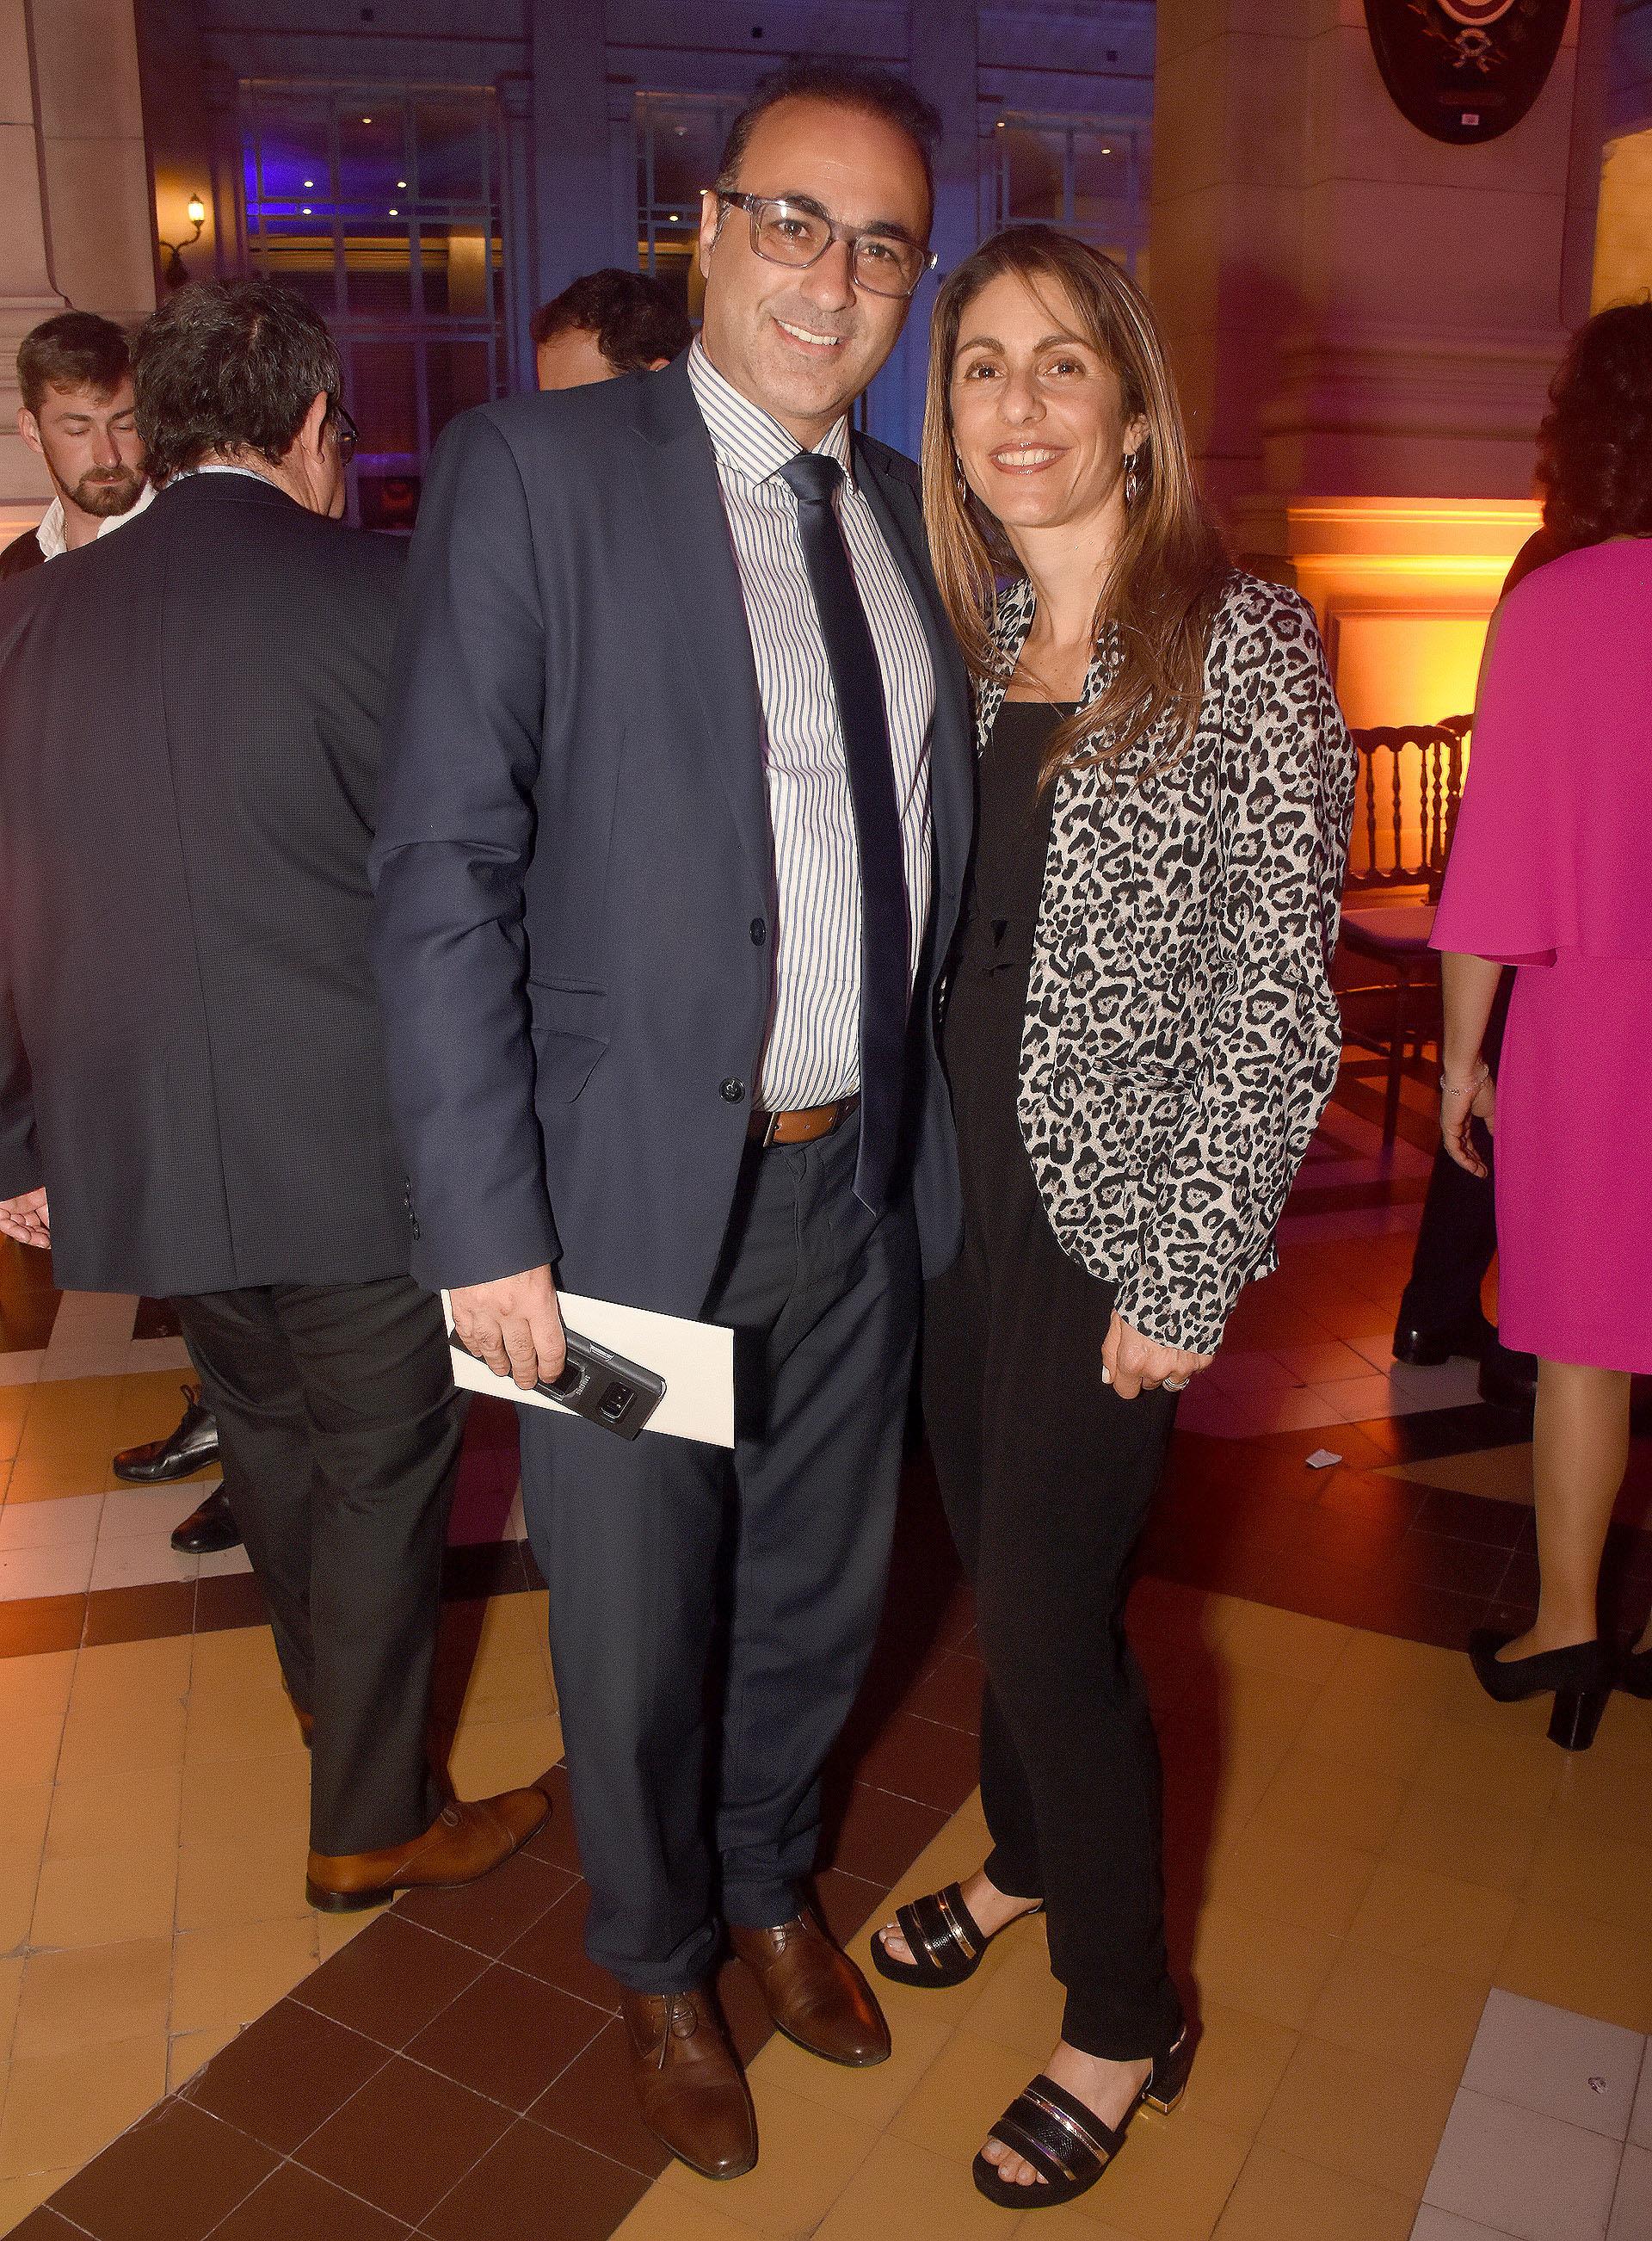 Gustavo Sakkal, vicepresidente del Museo del Holocausto, junto a su esposa Lorena Sakkal